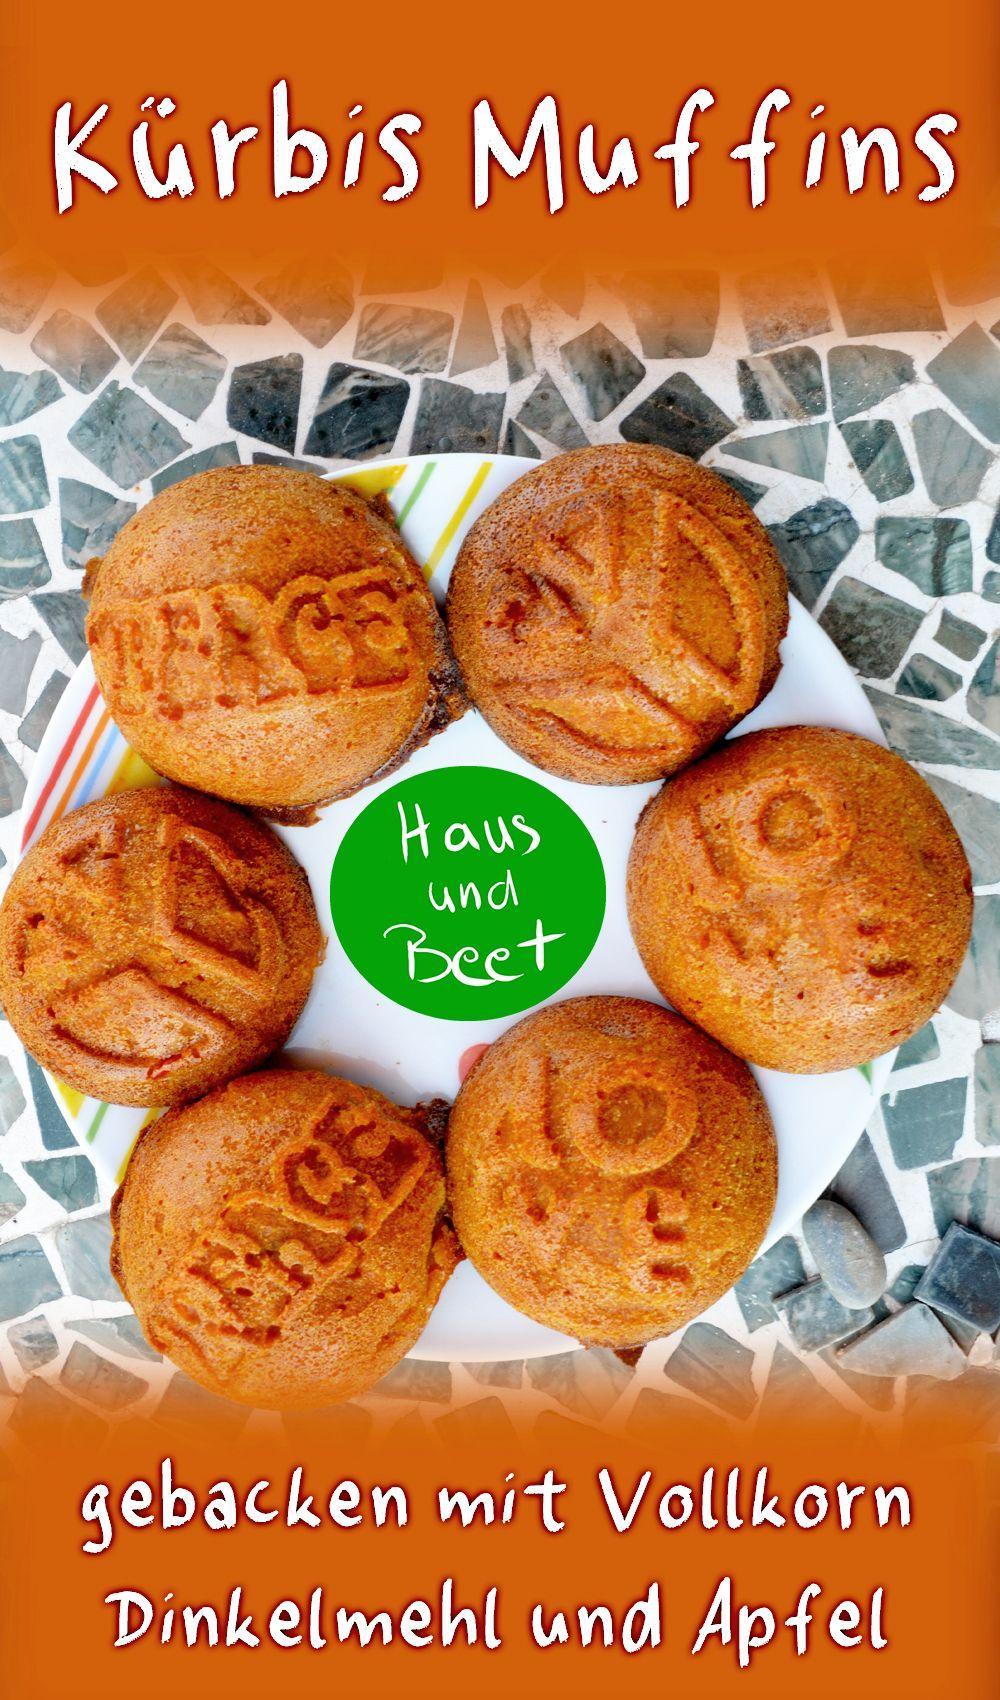 Pumpkin Muffins - Sweet Healthy Dessert - Home and Bed - #dessert #healthy #muffins #pumpkin #sweet - #Muffins